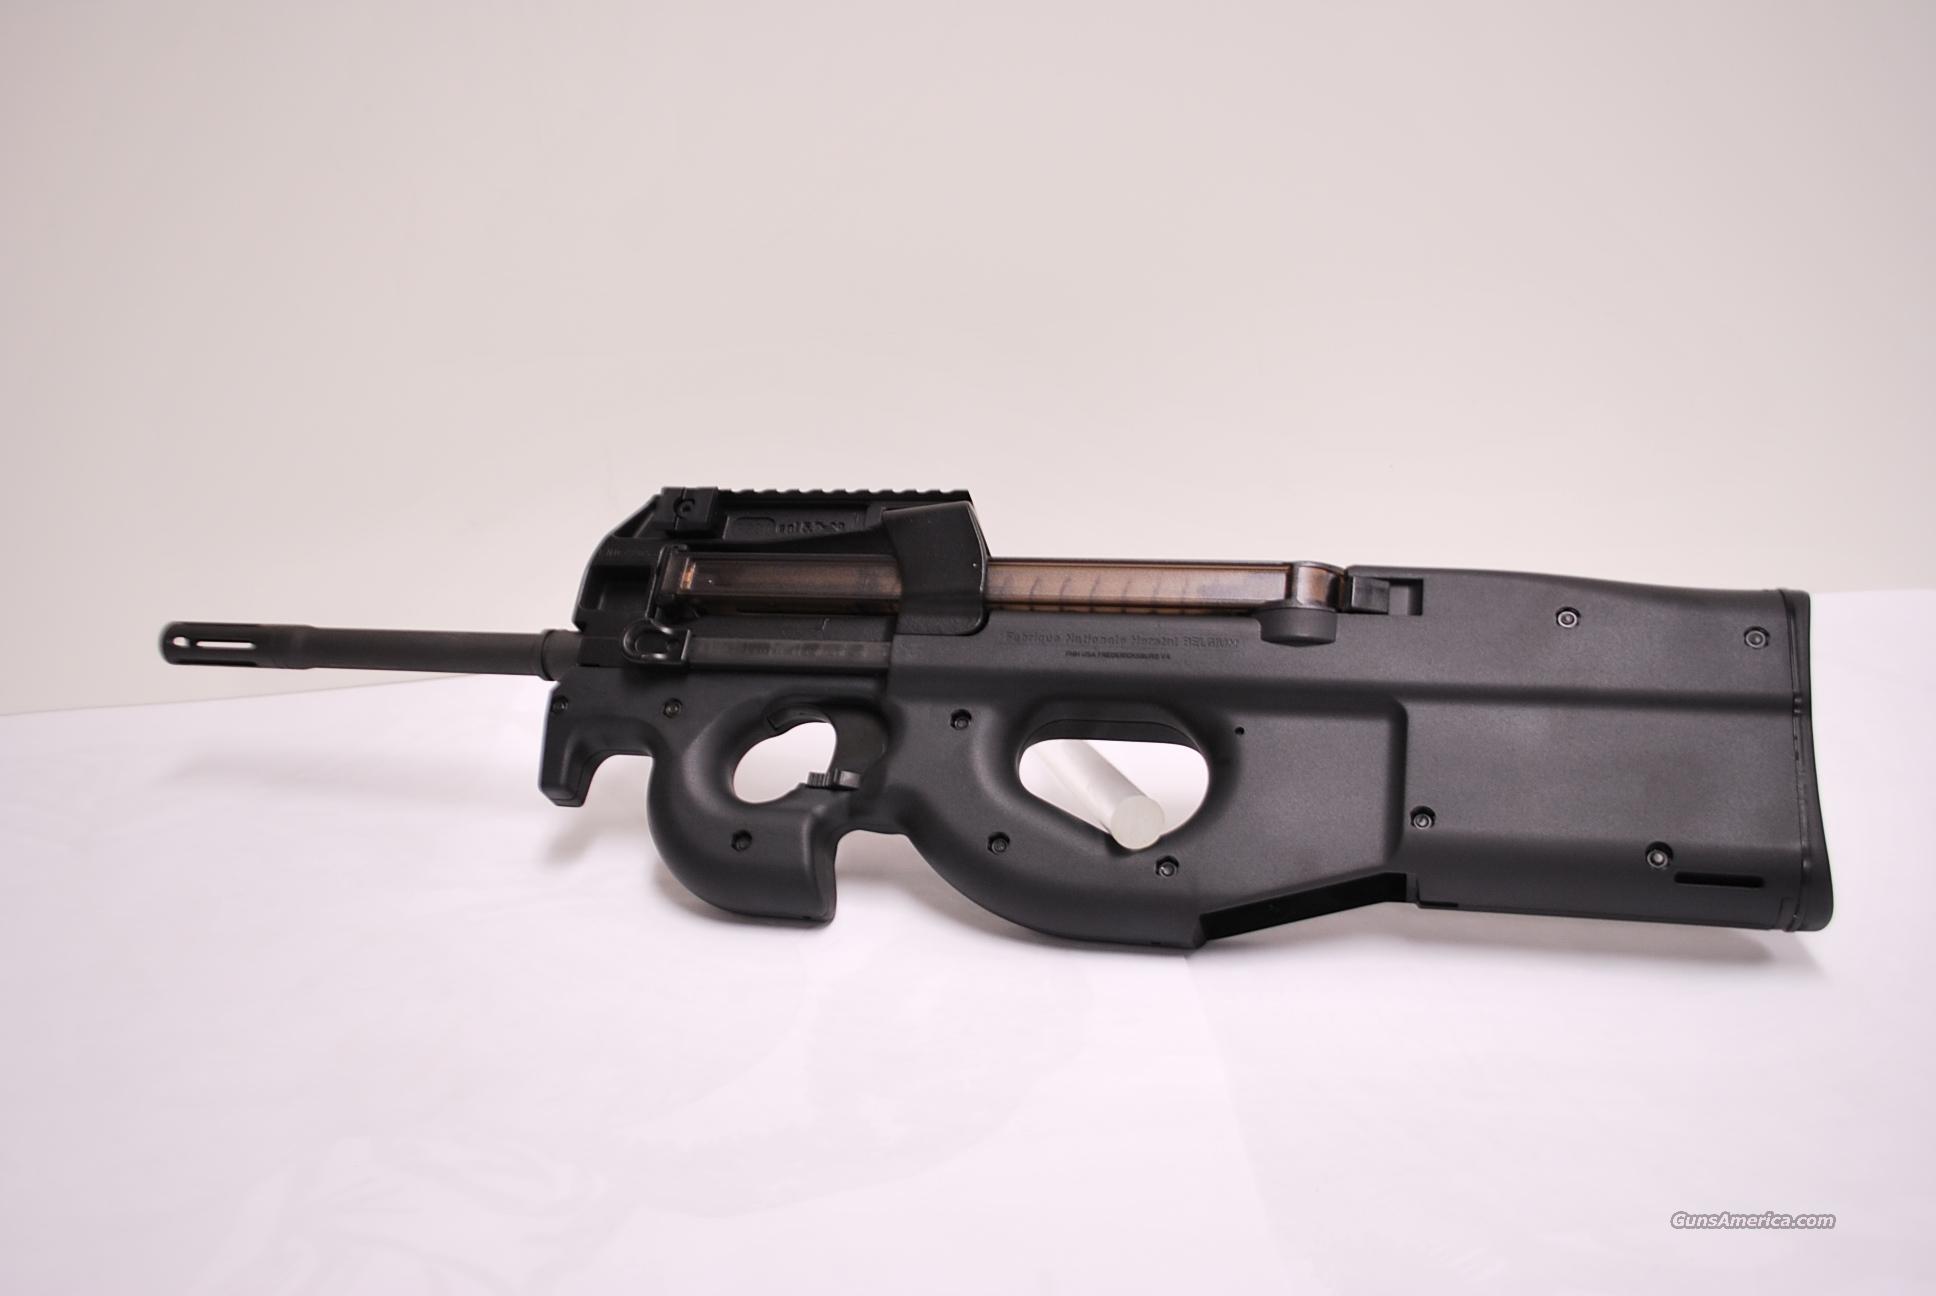 Ps90 For Sale >> FN PS90 5.7x28mm Triple Rail Semi Auto Carbine for sale